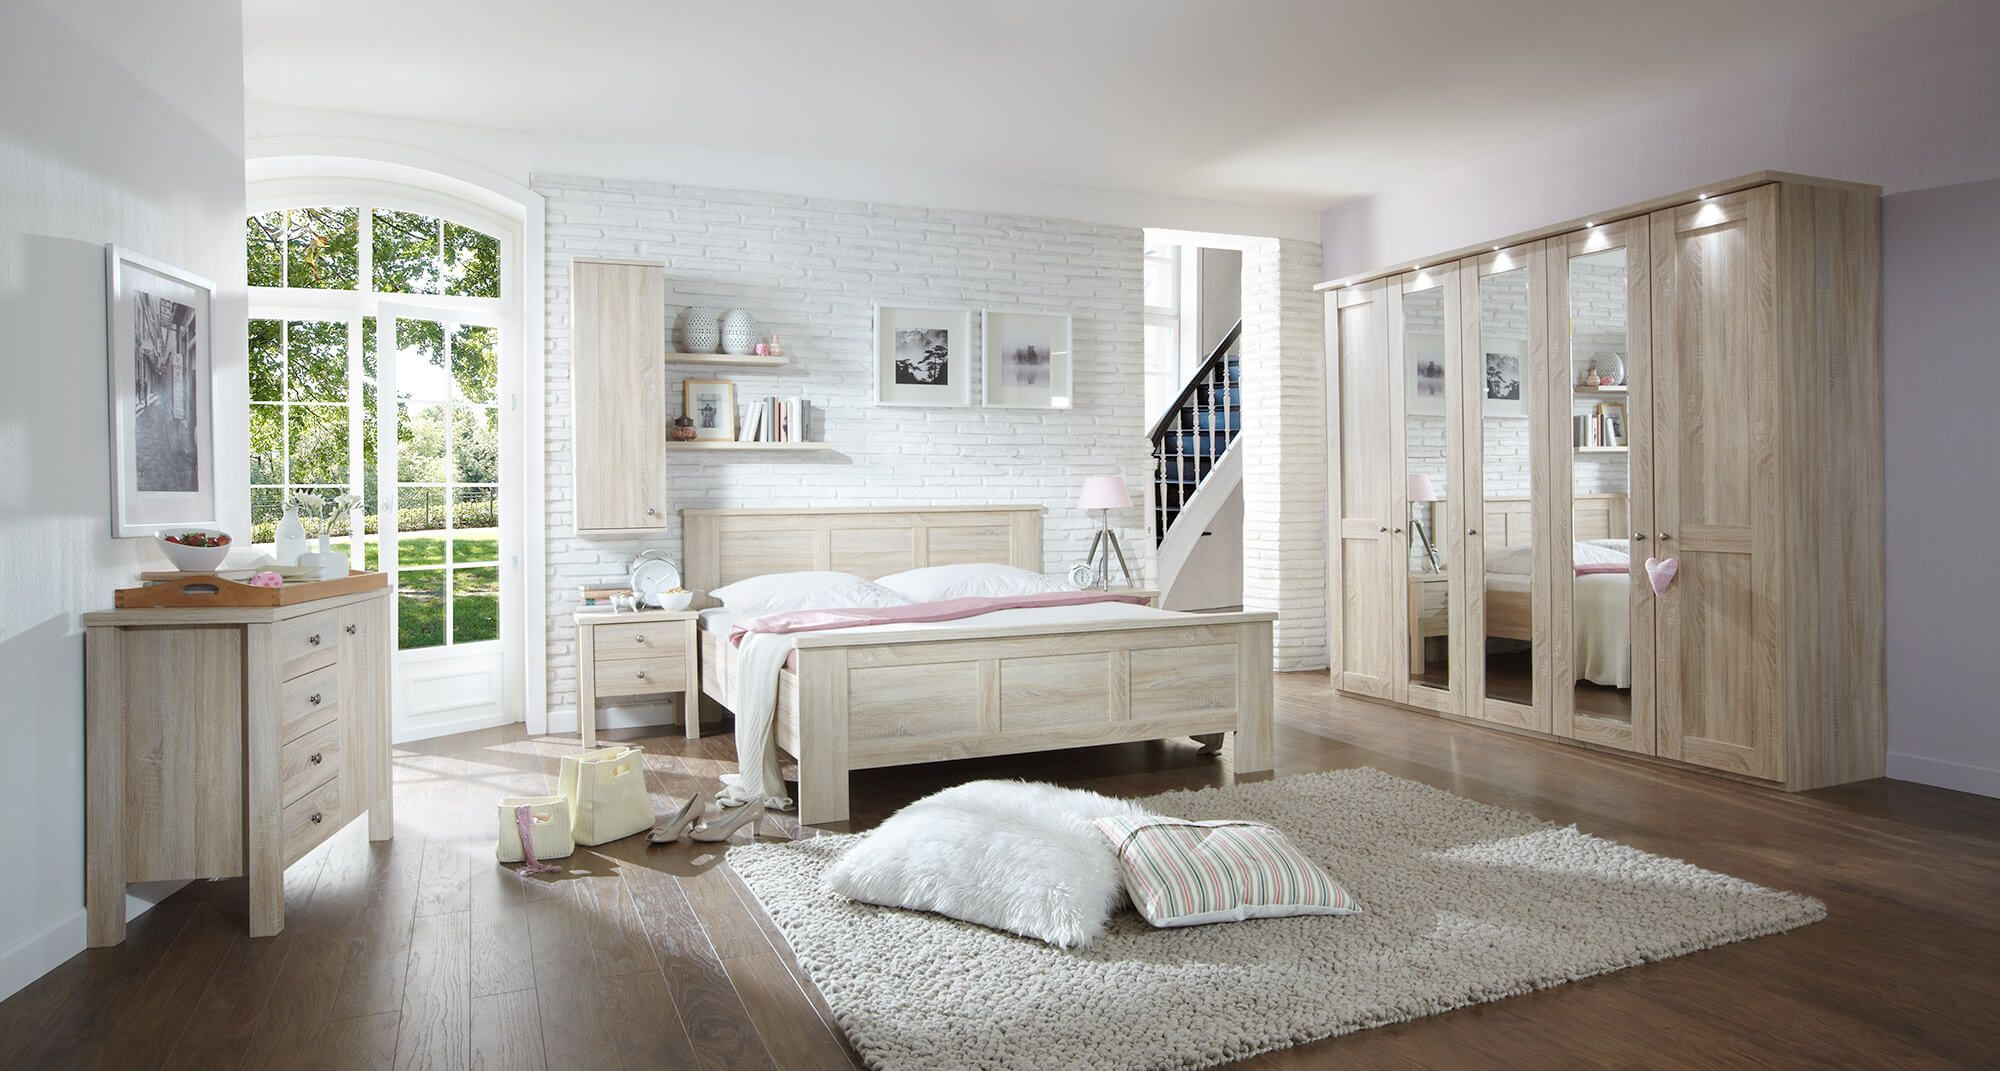 Slaapkamer Bergamo Bed 160x200 2 Nachttafels Kledingkast 250cm Kranslijst Incl Verlichting Thuisdecoratie Bergamo Slaapkamerdesigns